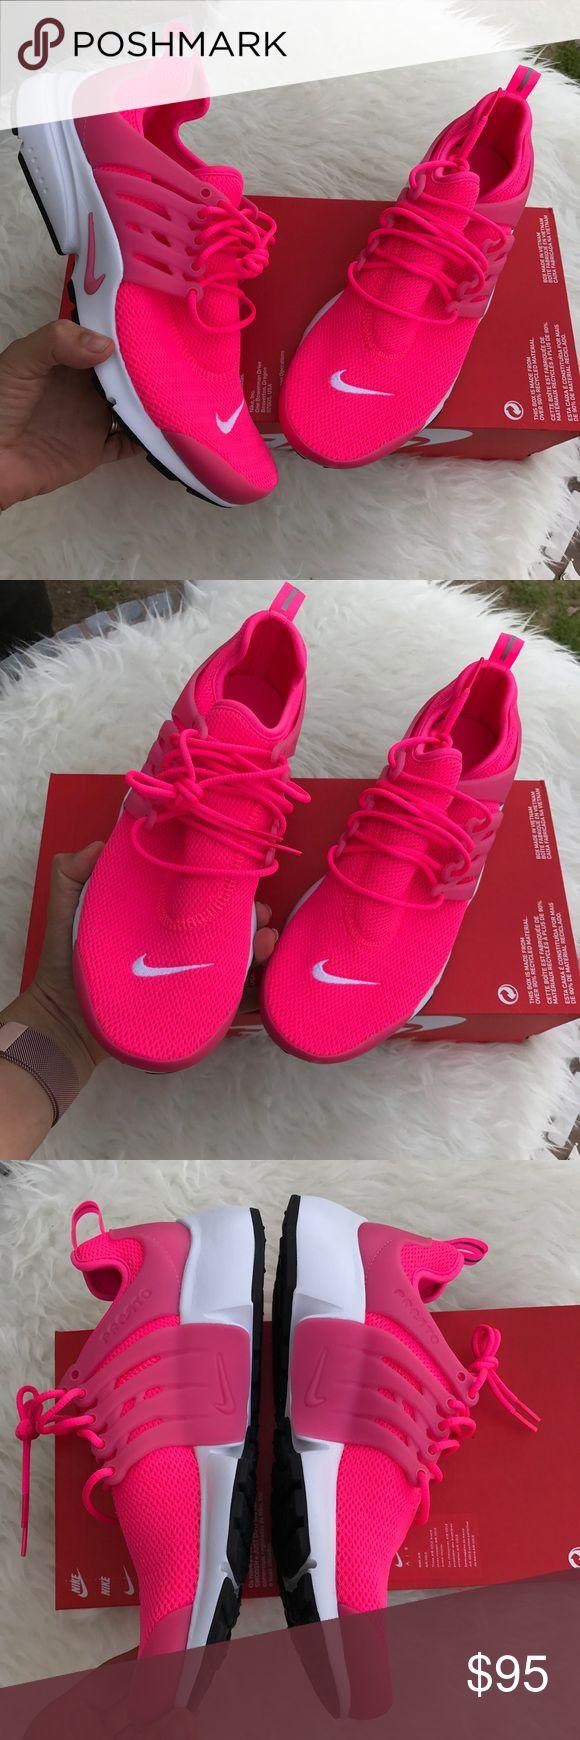 NIKE WOMENS AIR PRESTO Sz 9 new NIKE WOMENS AIR PRESTO Sz 9 new BOX IS MISSING LID 100% authentic! Itemcloset#cindo Nike Shoes